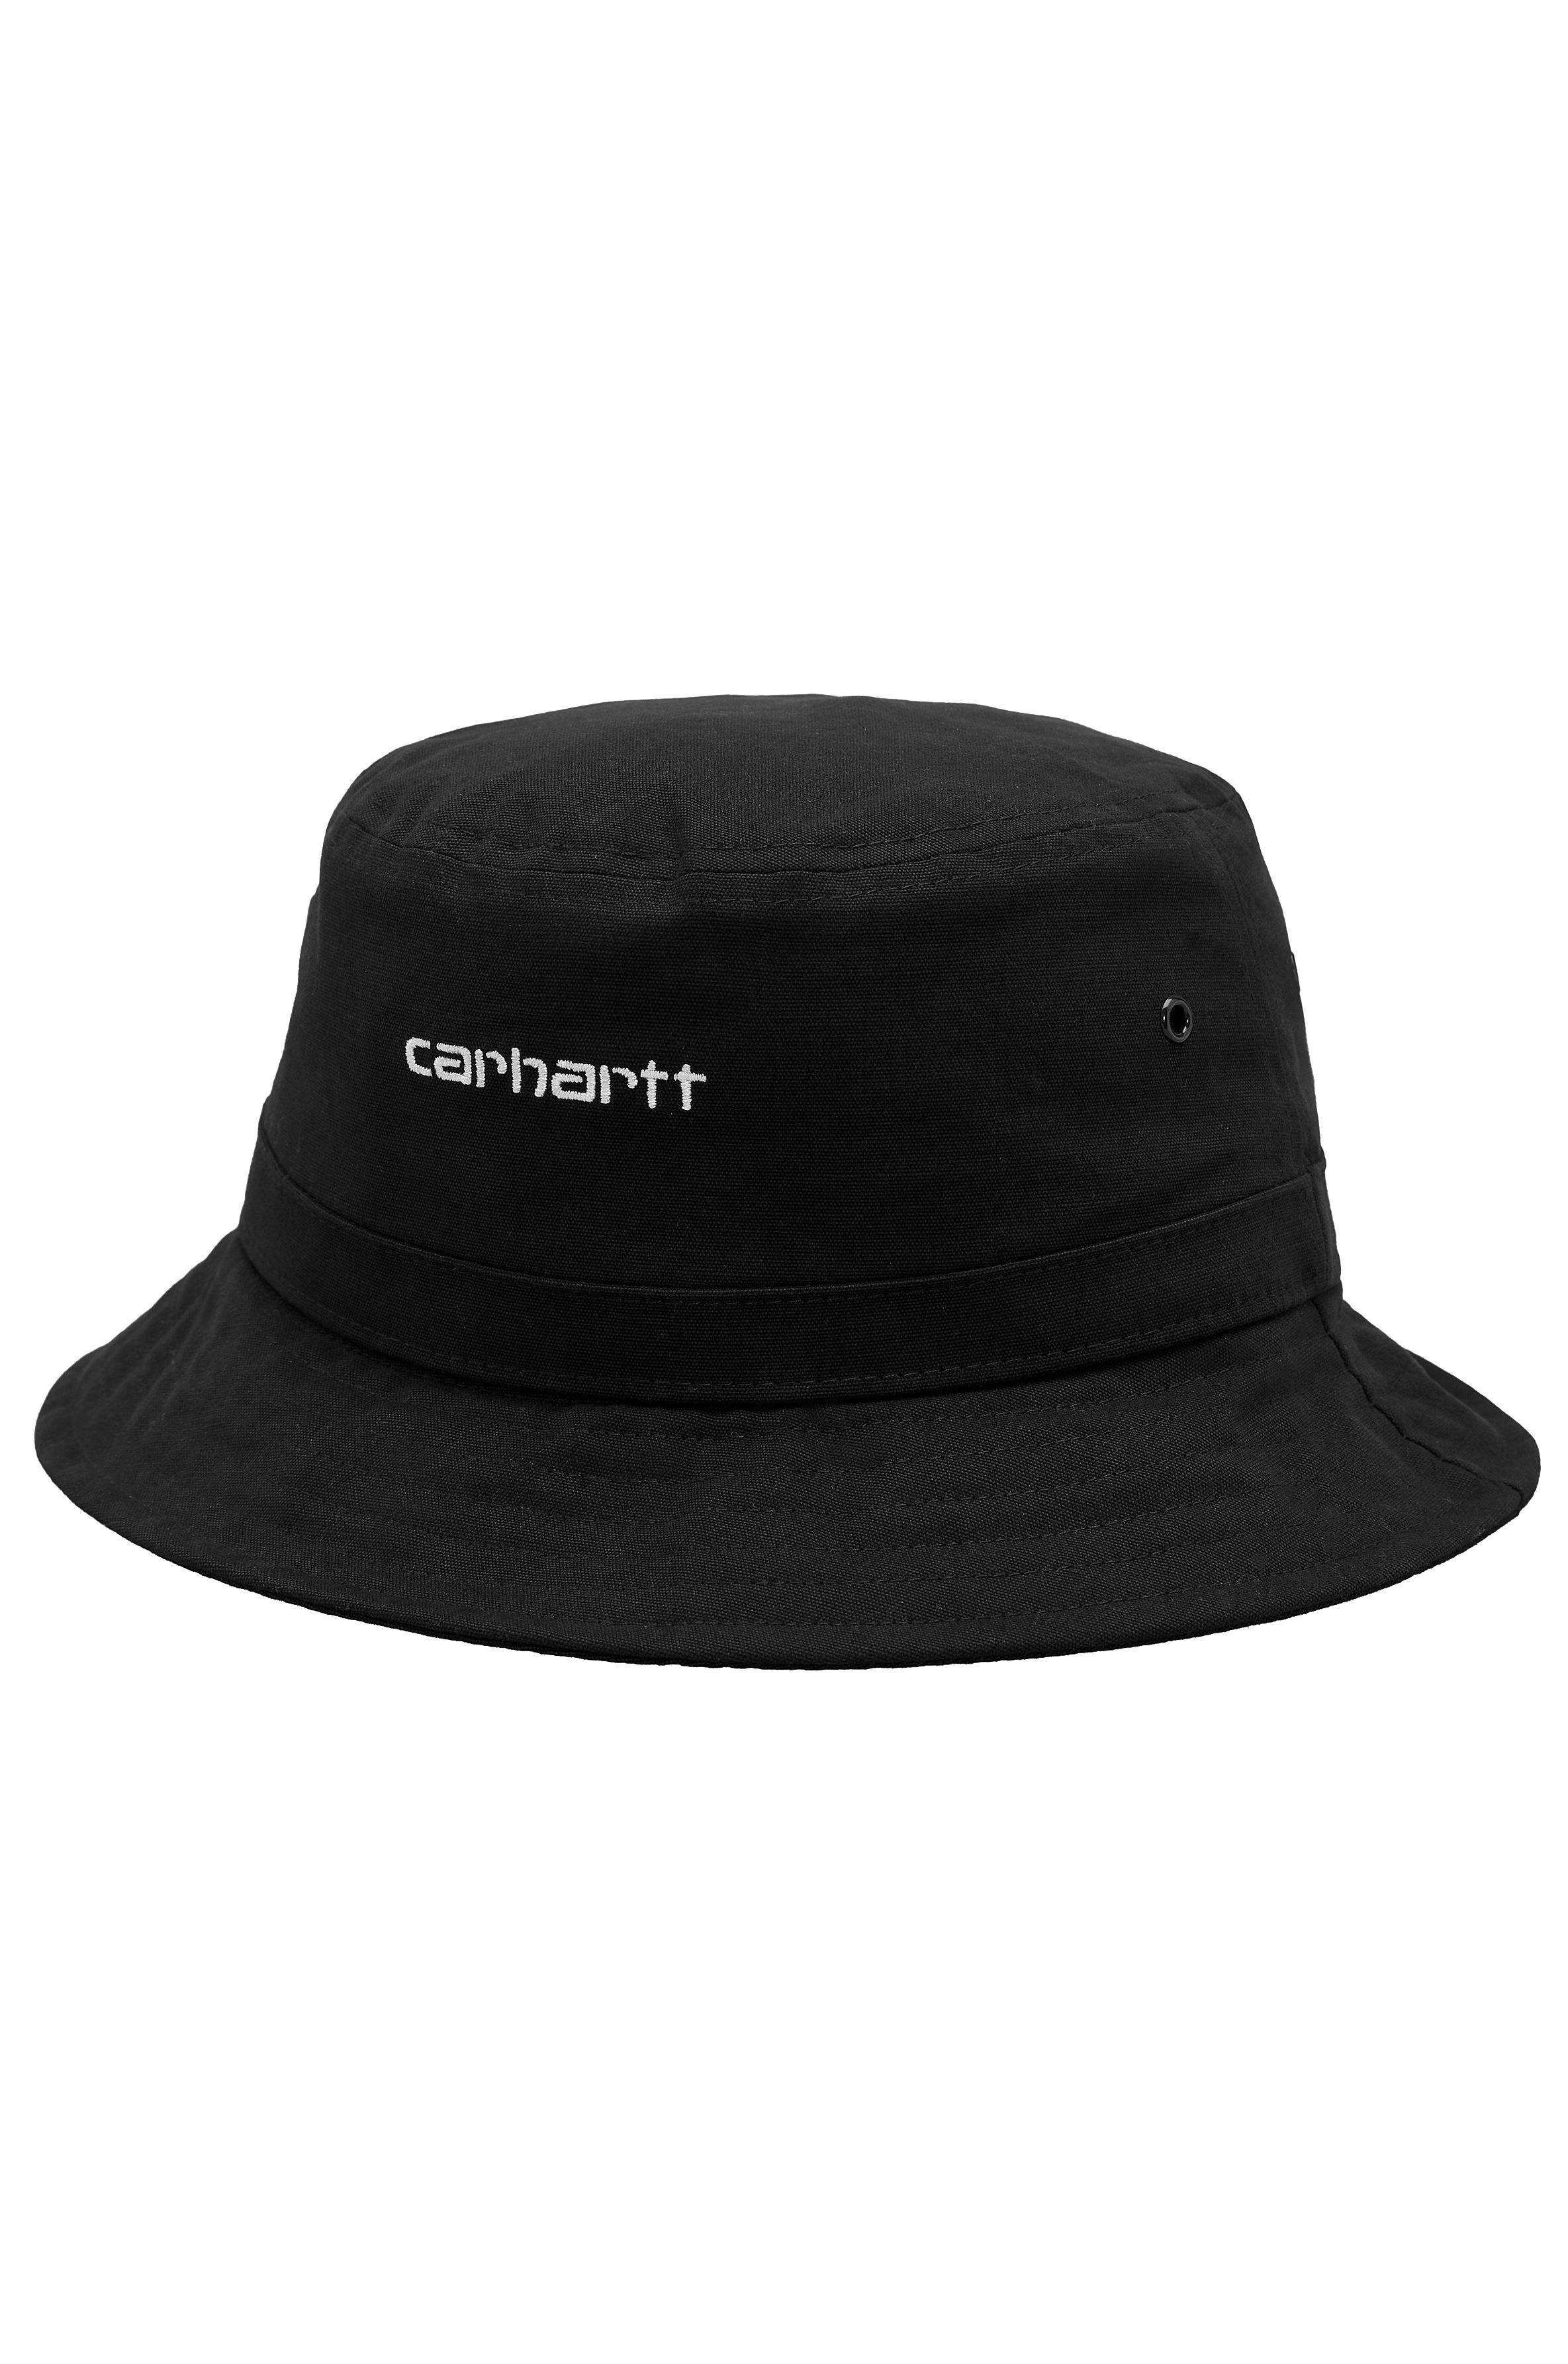 Chapeu Carhartt WIP SCRIPT BUCKET Black/White